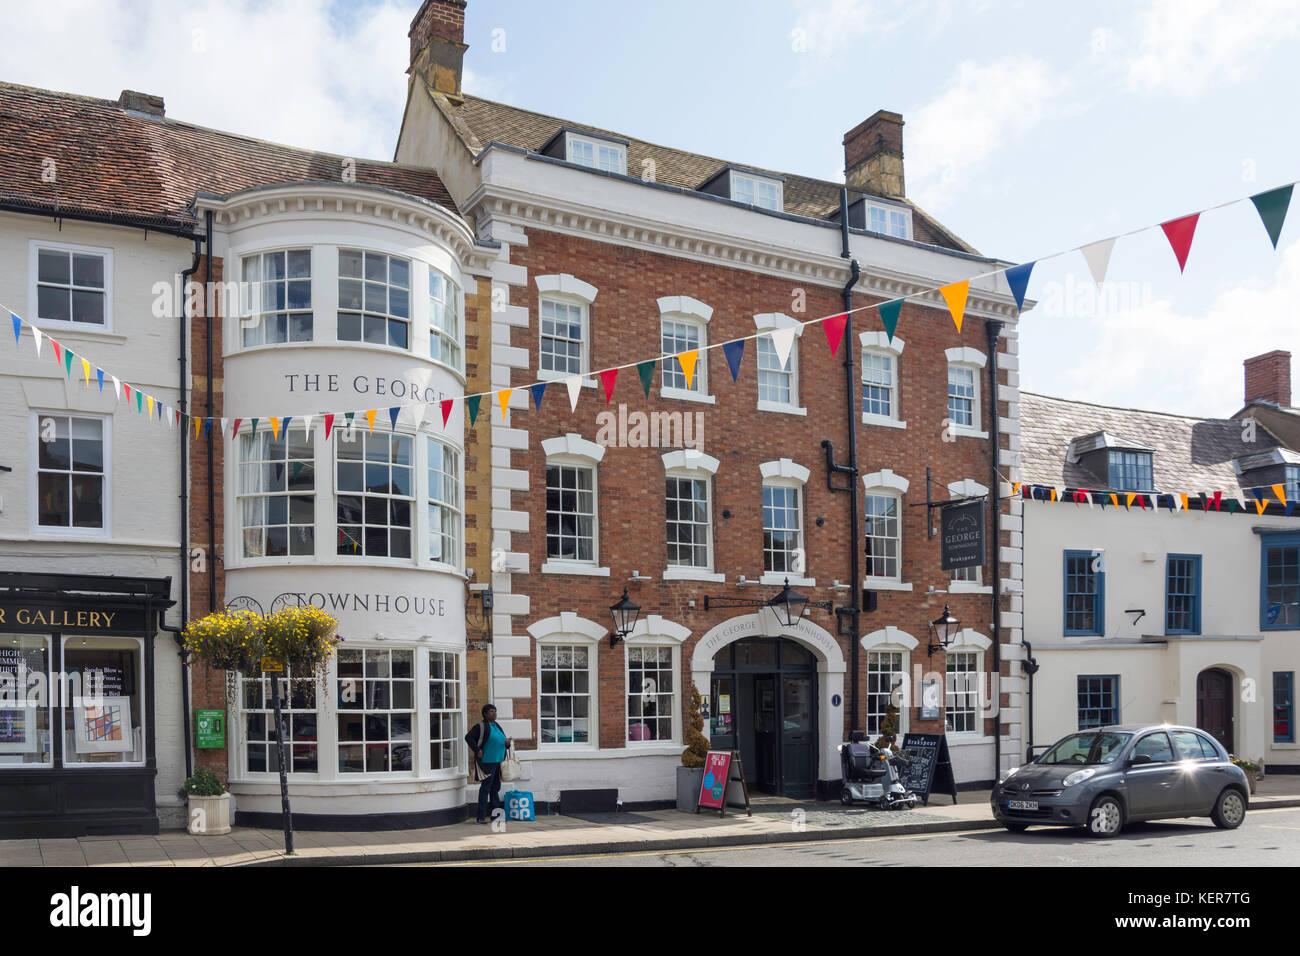 18th century The George Townhouse Inn, High Street, Shipston-on-Stour, Warwickshire, England, United Kingdom - Stock Image